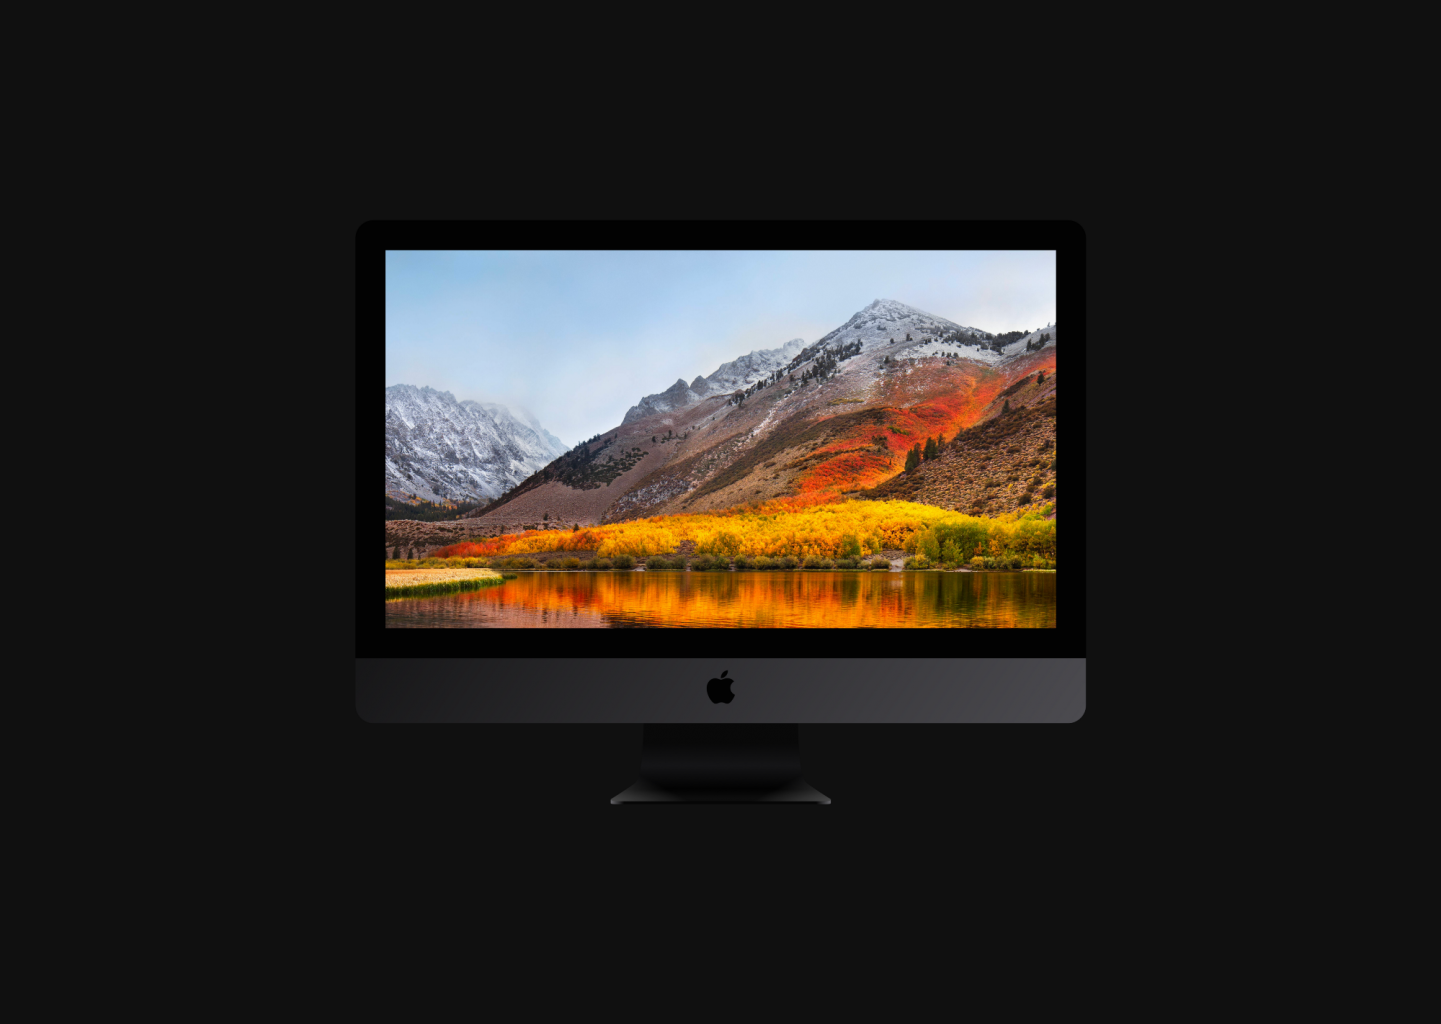 iMac Pro搭载A10芯片 我们仍可看出苹果的重视